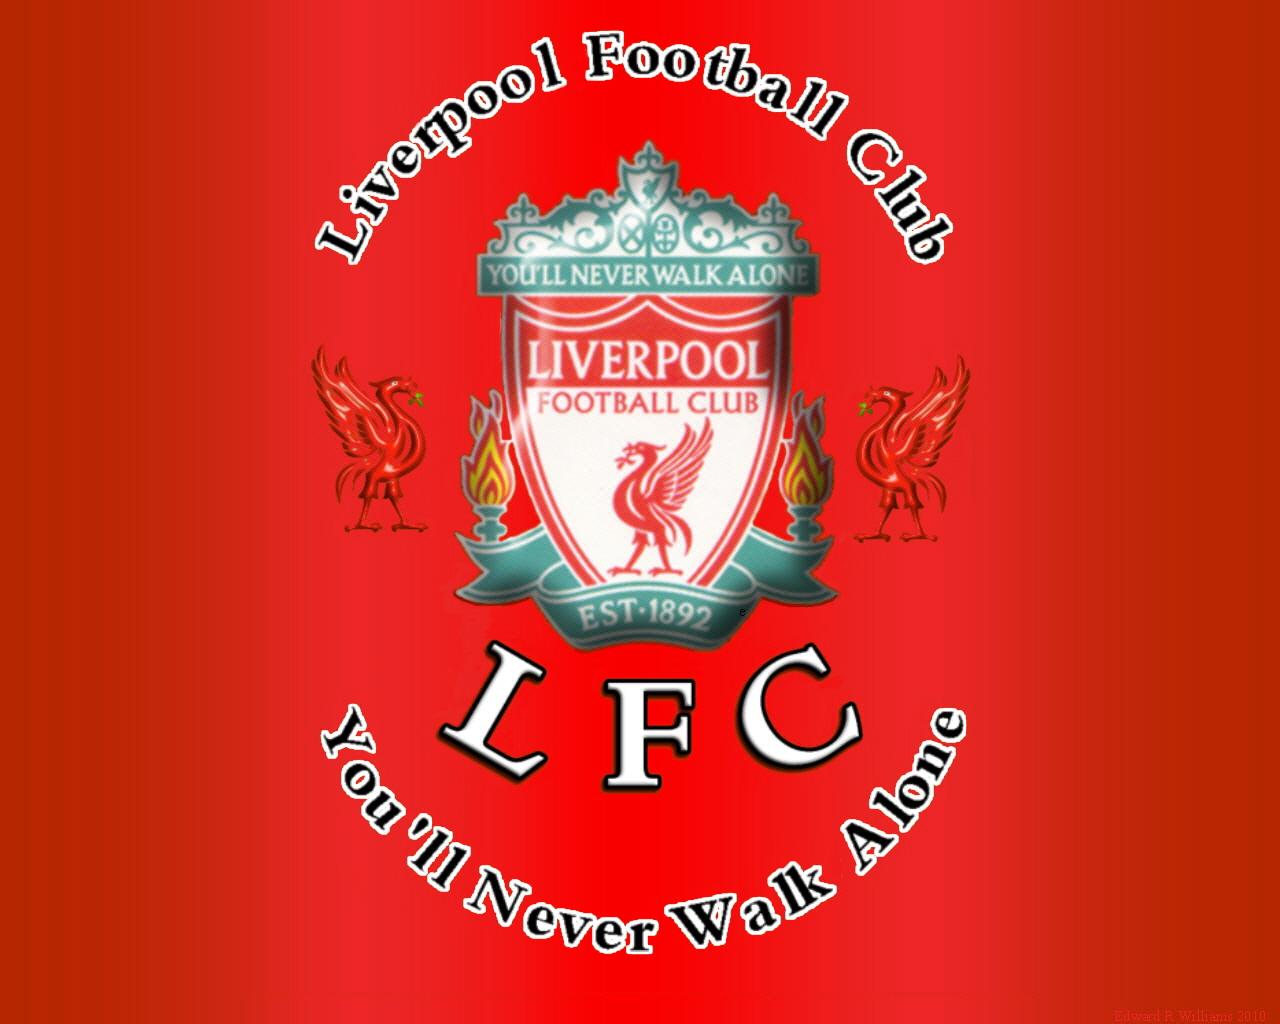 More Liverpool wallpapers Liverpool wallpapers 1280x1024